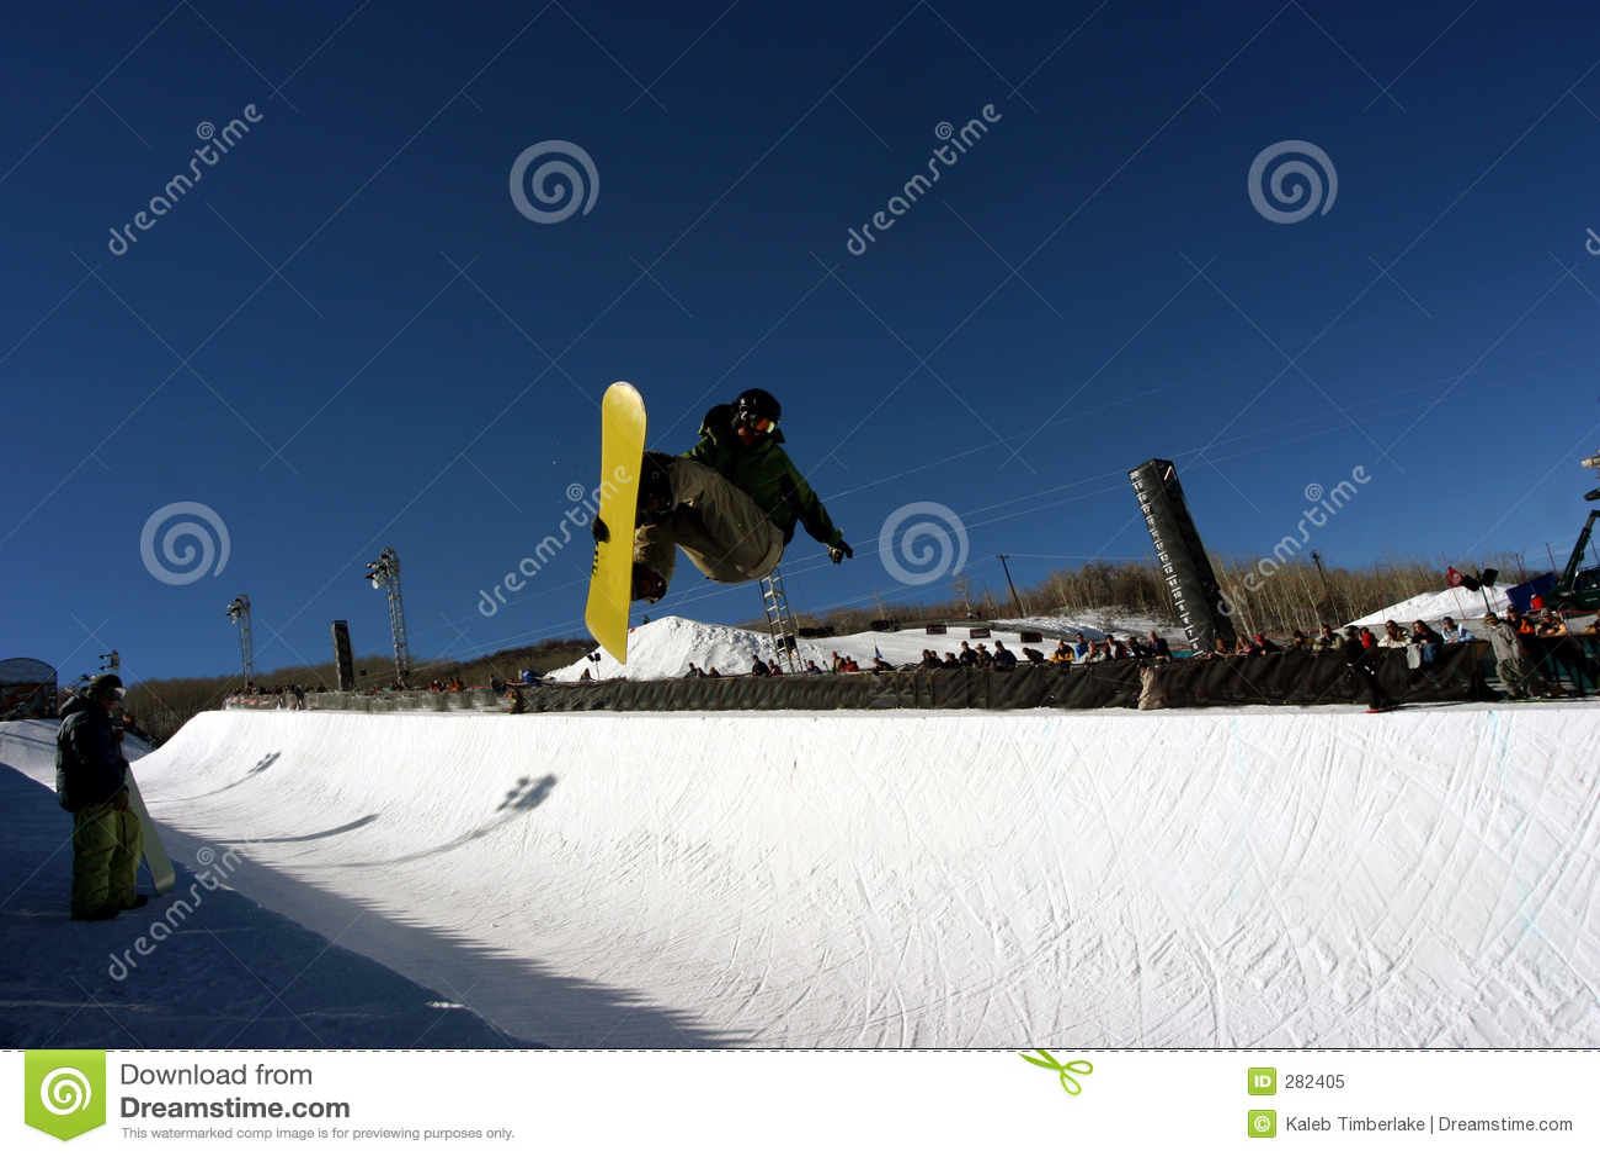 Halfpipe snowboarder 2